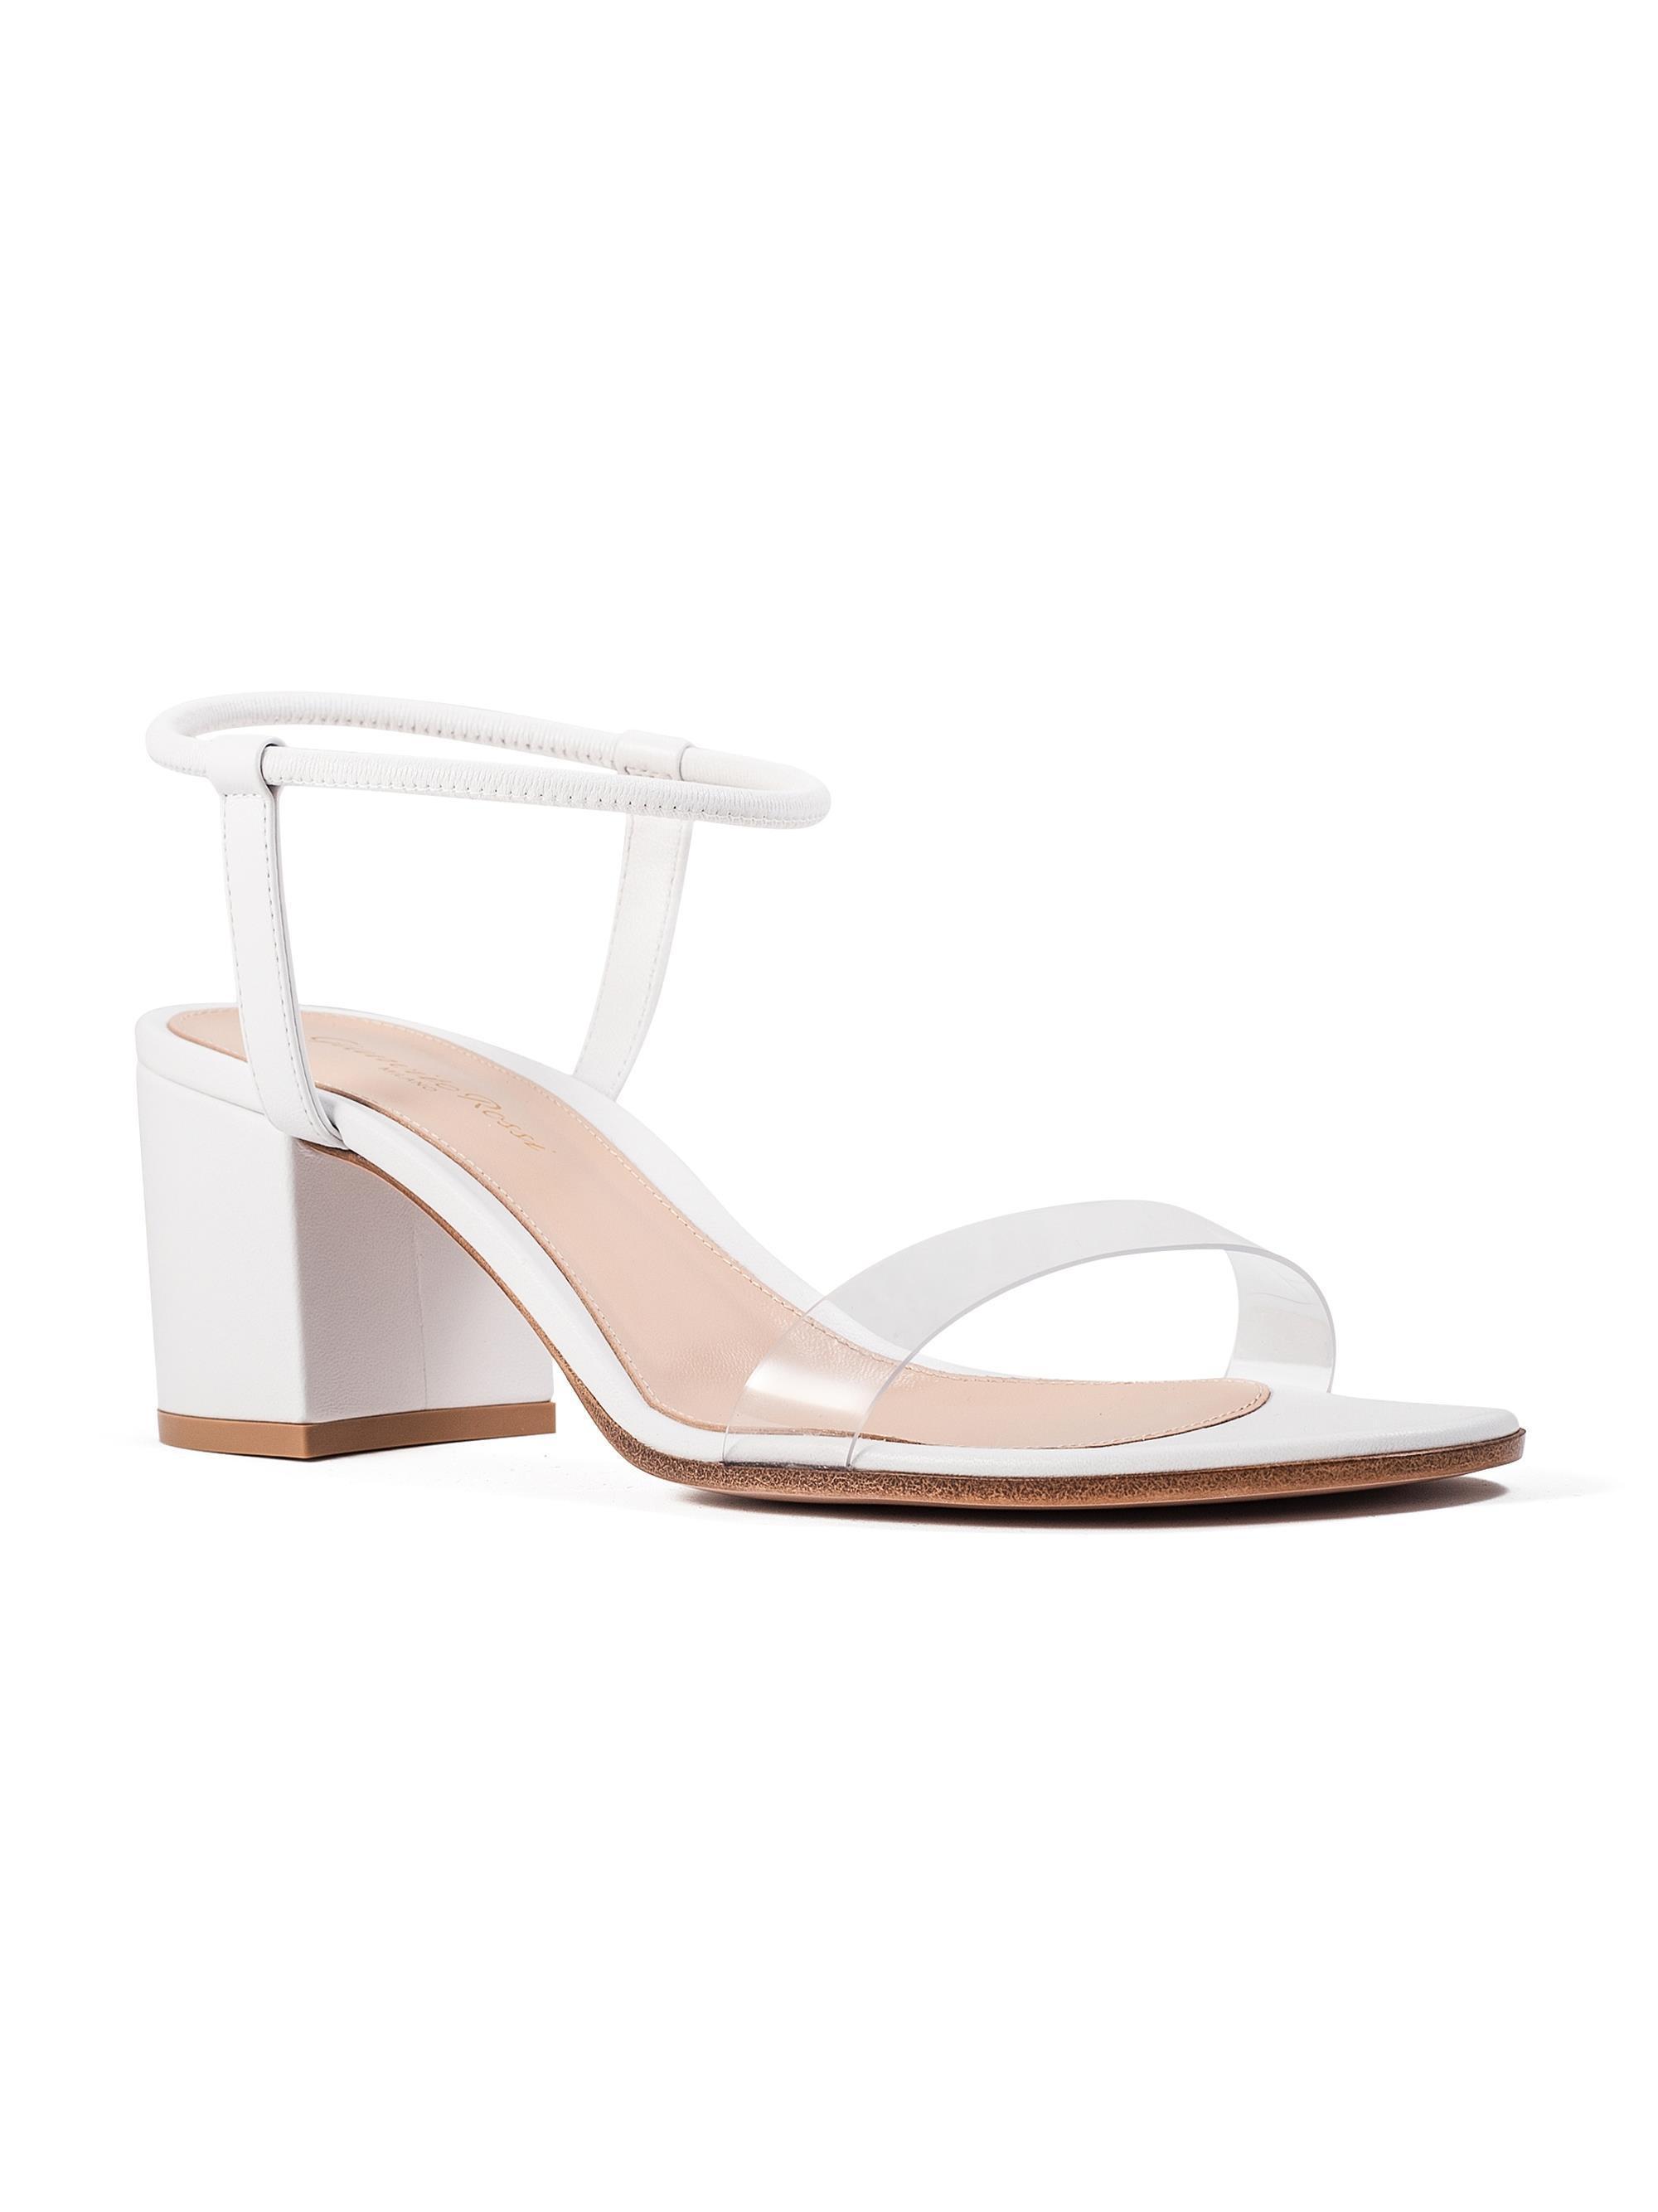 0f8ca7b1d7e Lyst - Gianvito Rossi Transparent Strap Sandals in White - Save  8.862876254180605%